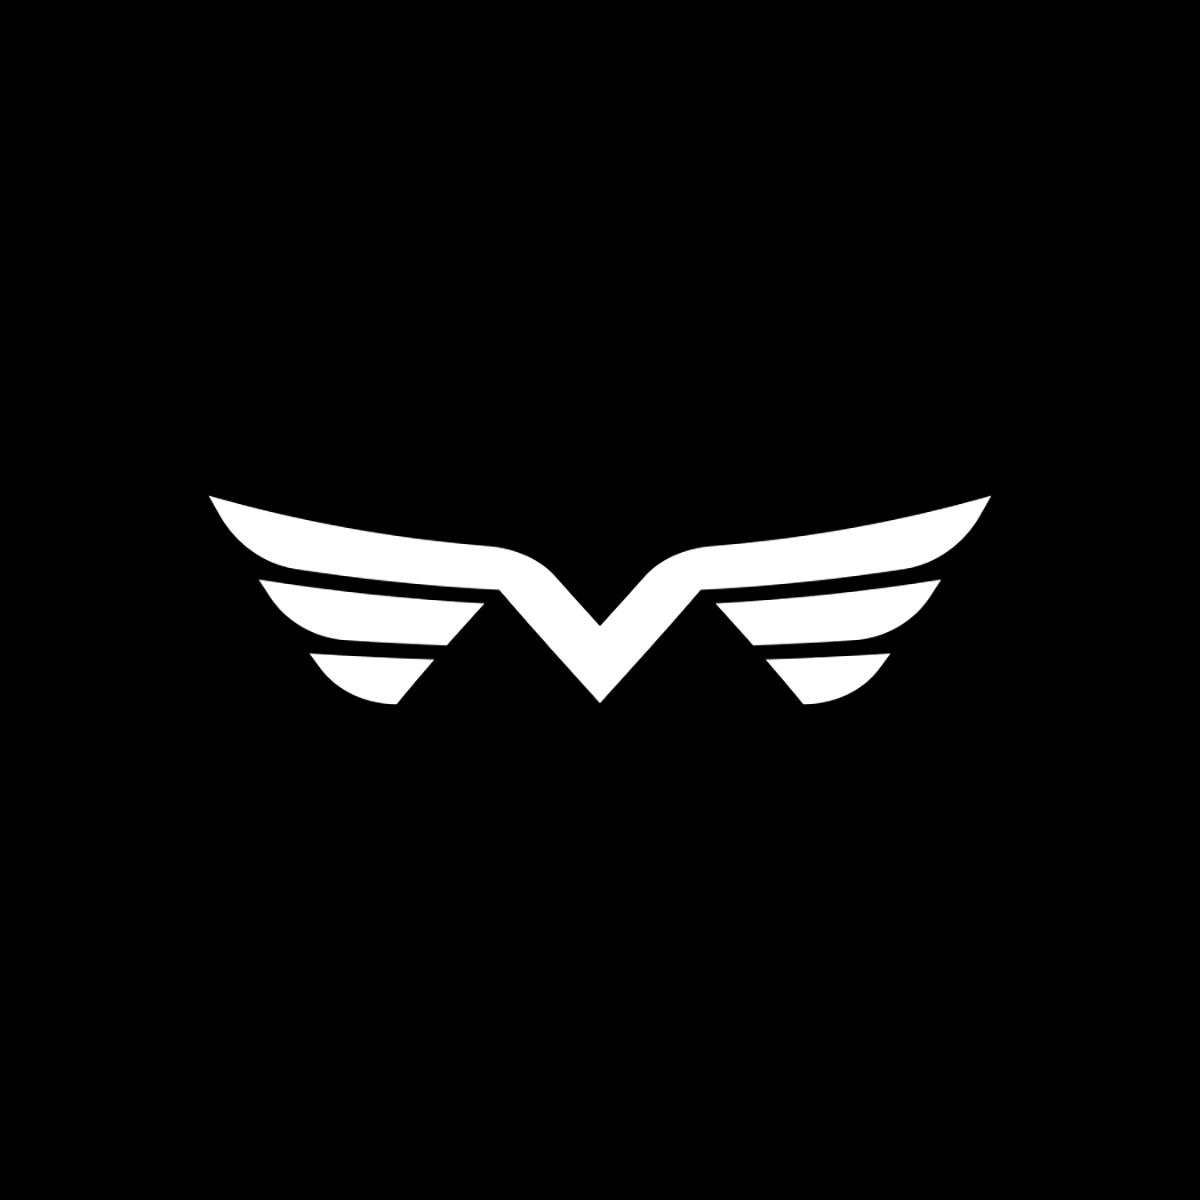 Mike Schaeffer Design on LogoLounge